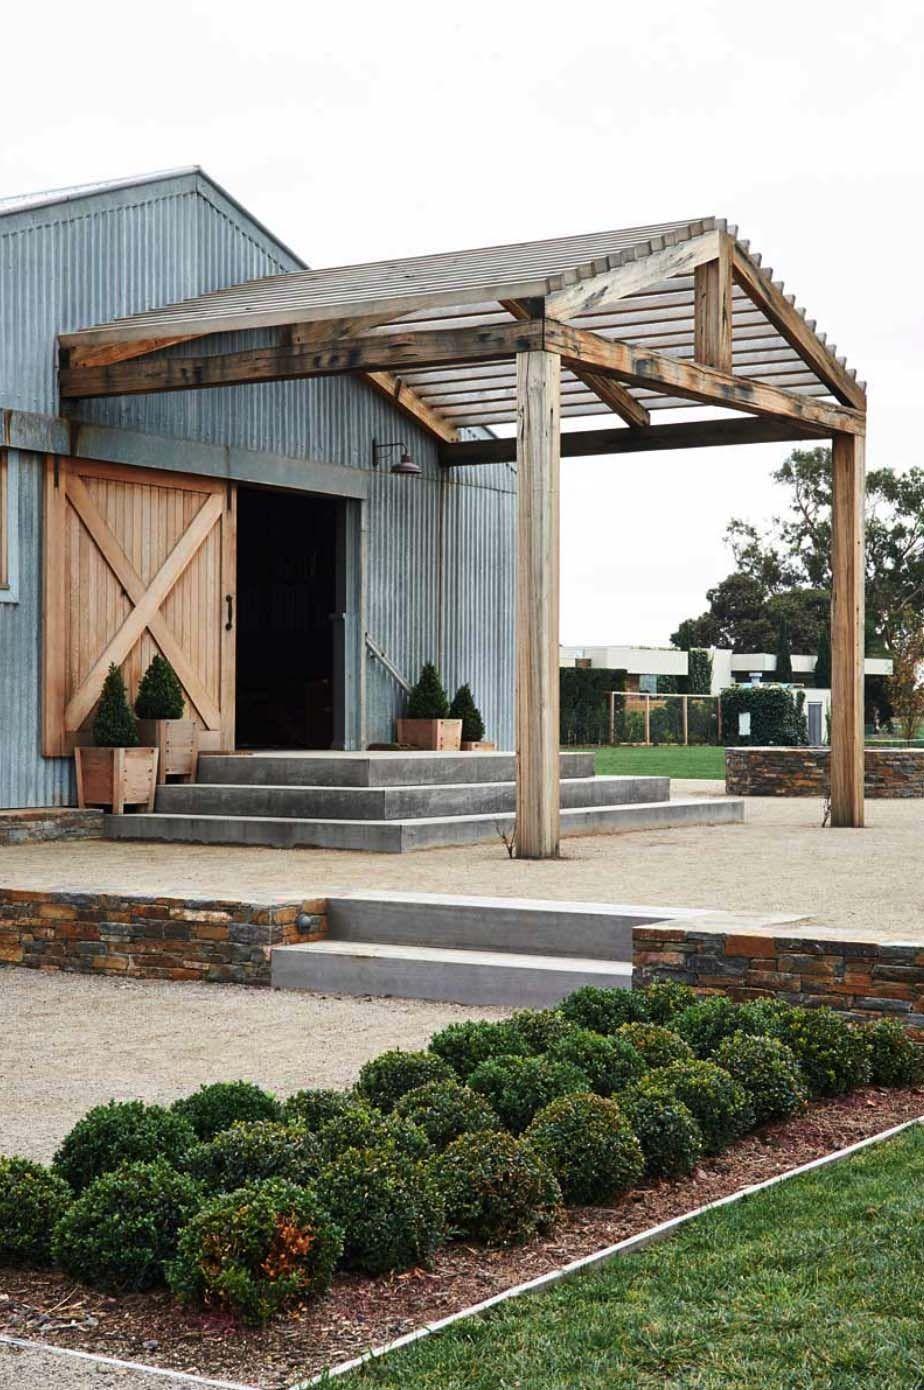 Thinking outside the box: Modern barn conversion in Australia #barndominiumideas